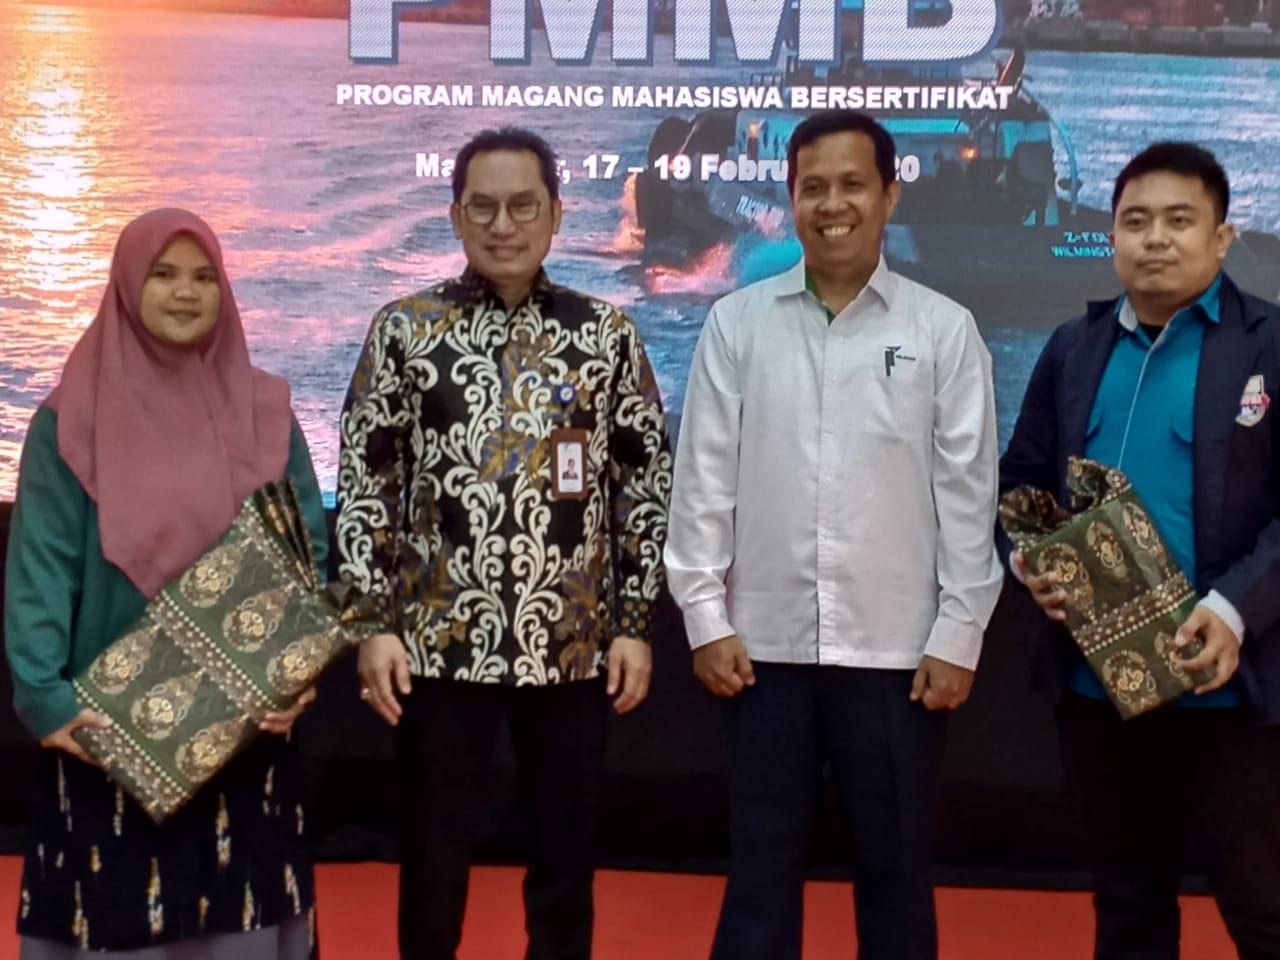 MAHASISWA FT UNIBOS MENJADI TERBAIK KE-DUA DALAM PROGRAM MAGANG BUMN DI PELINDO IV